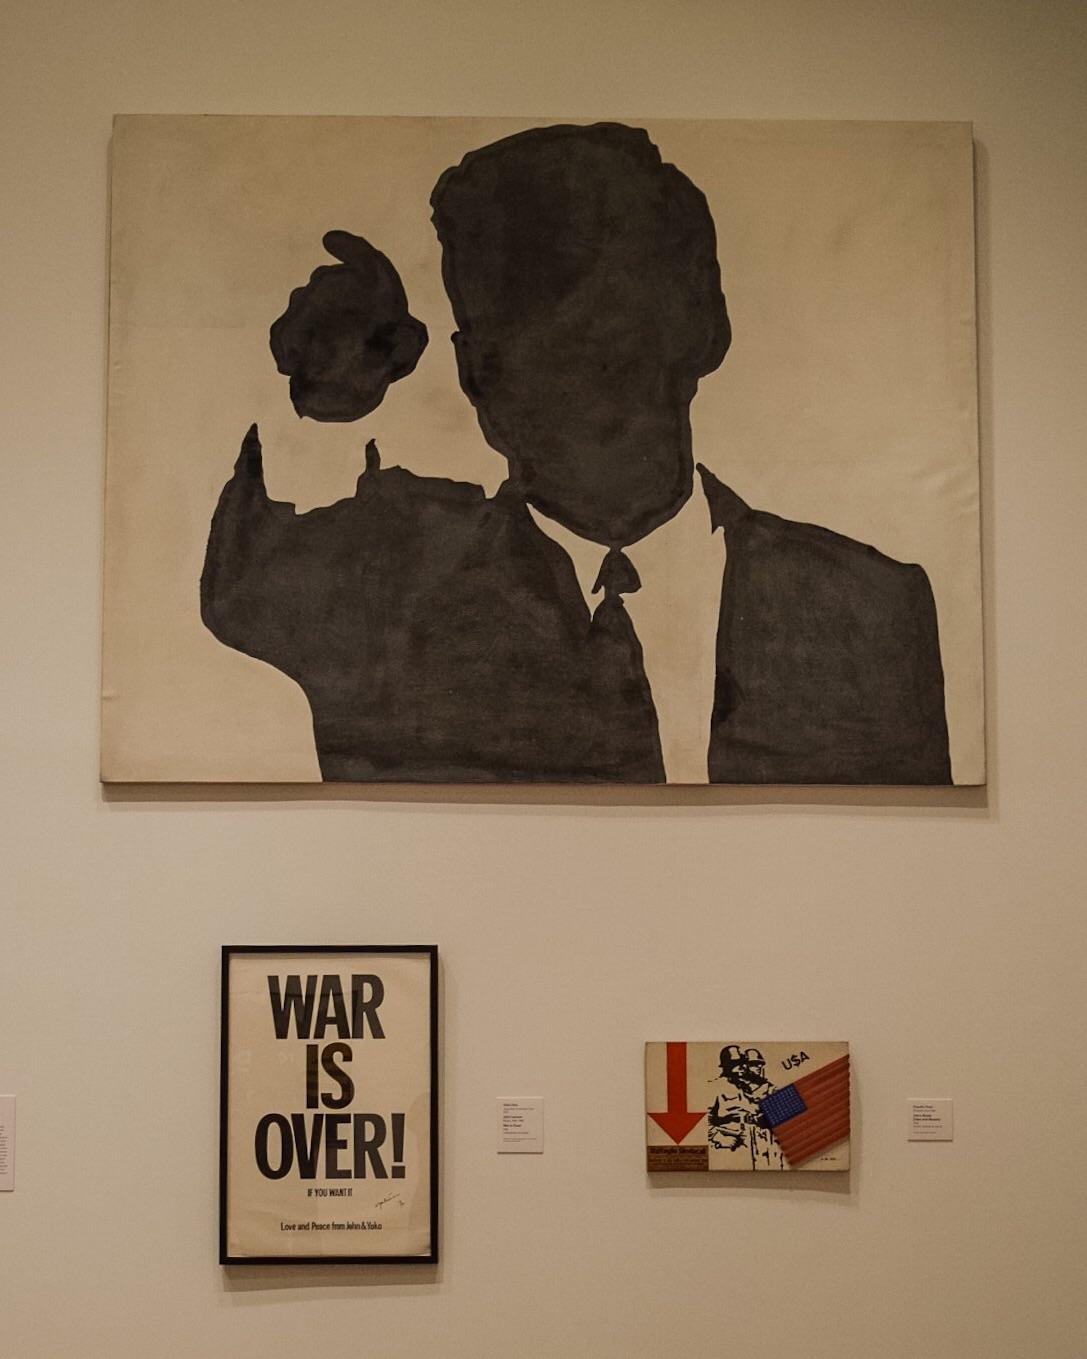 John Fitzgerald Kennedy, Sergio Lombardo, 1963  War is Over!, Yoko Ono & John Lennon, 1969  Uses and Abuses, Claudio Pozzi, 1966